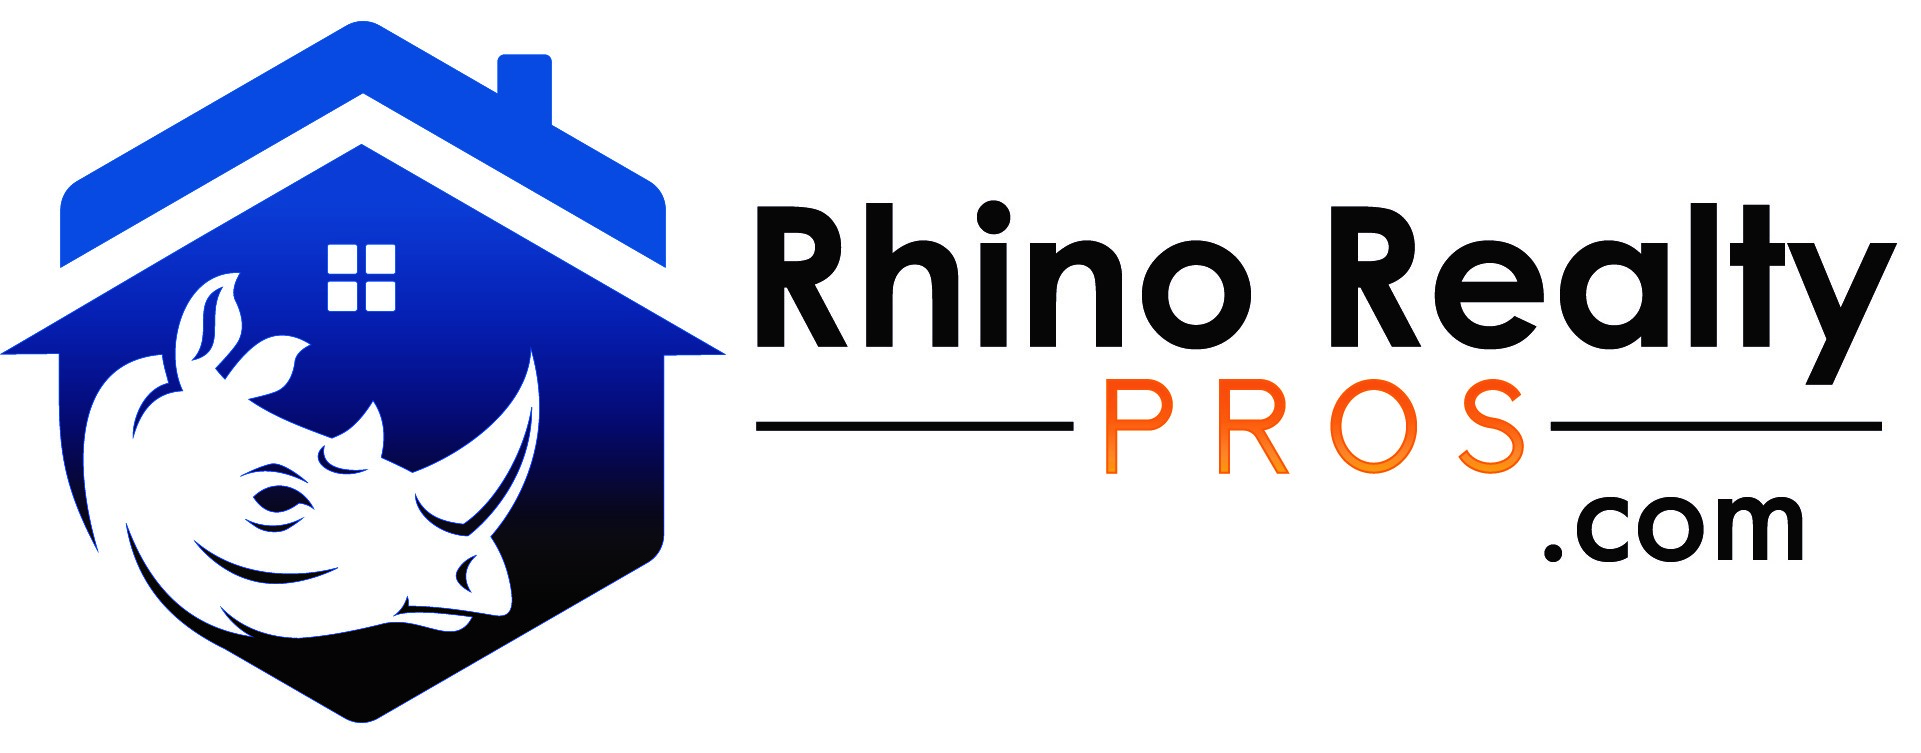 Rhino Realty Pros logo